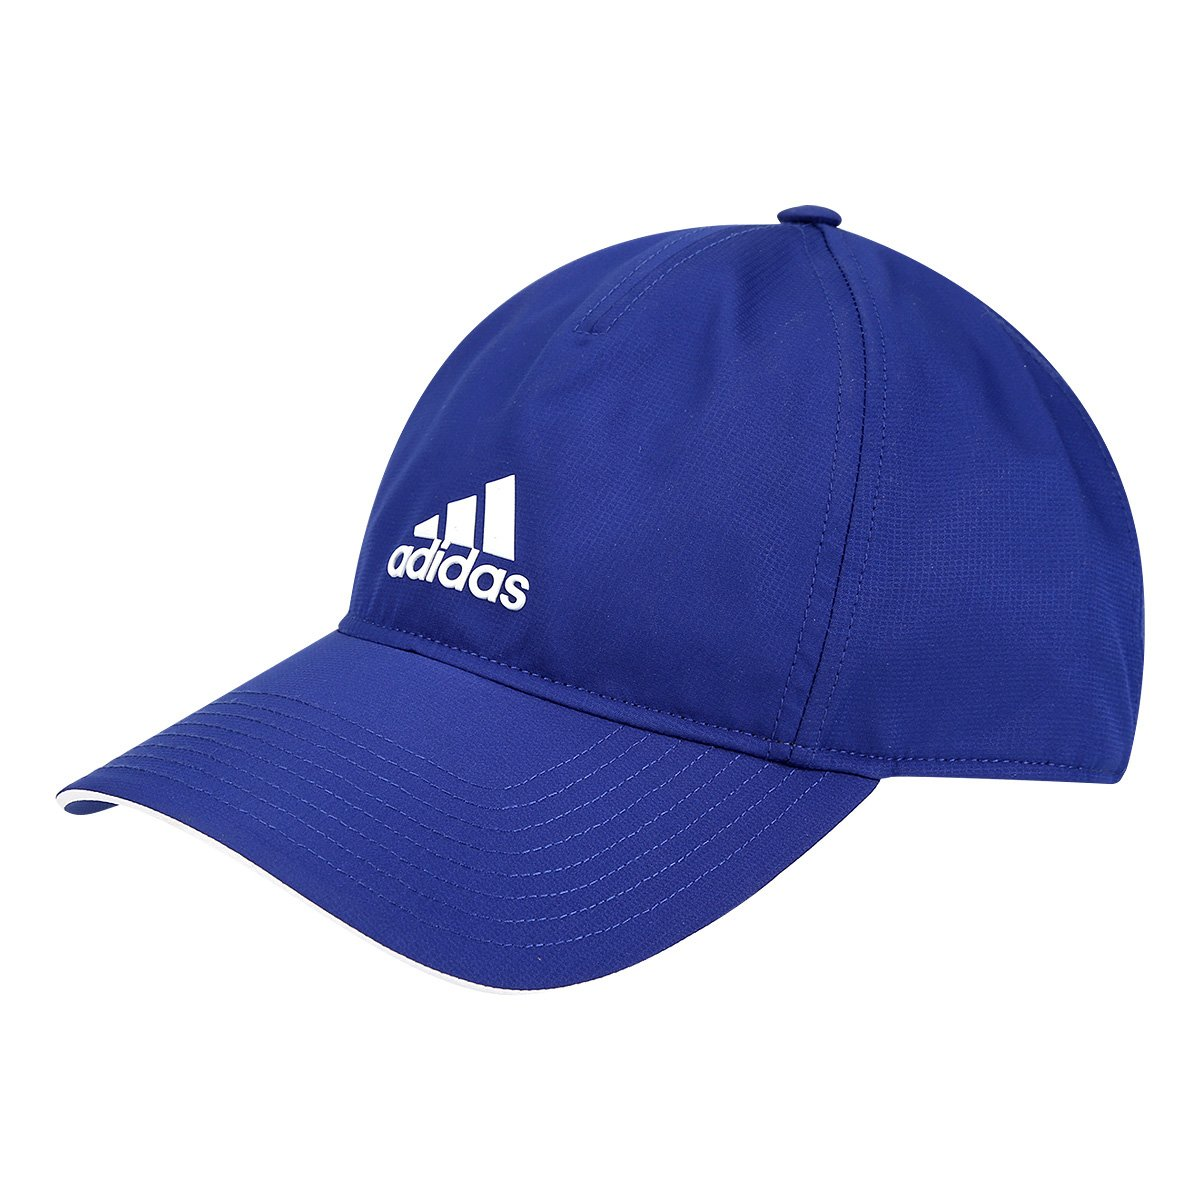 Boné Adidas Aba Curva Clima 5P Climalite Masculino - Compre Agora ... 2058546b999f6